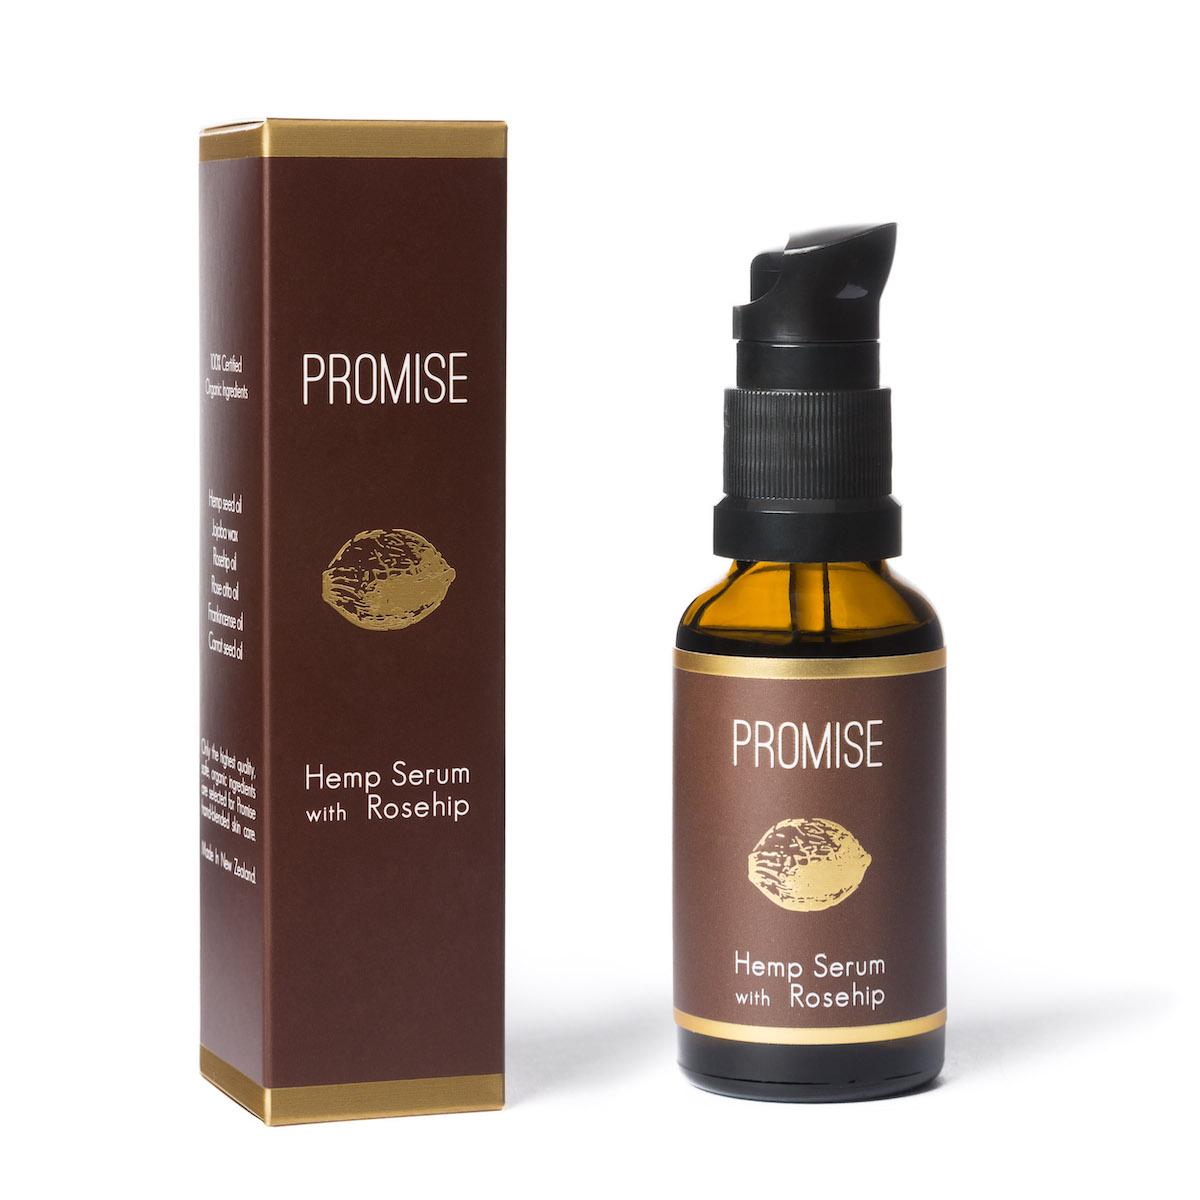 Promise ヘンプ美容液 (ローズヒップオイル入り)